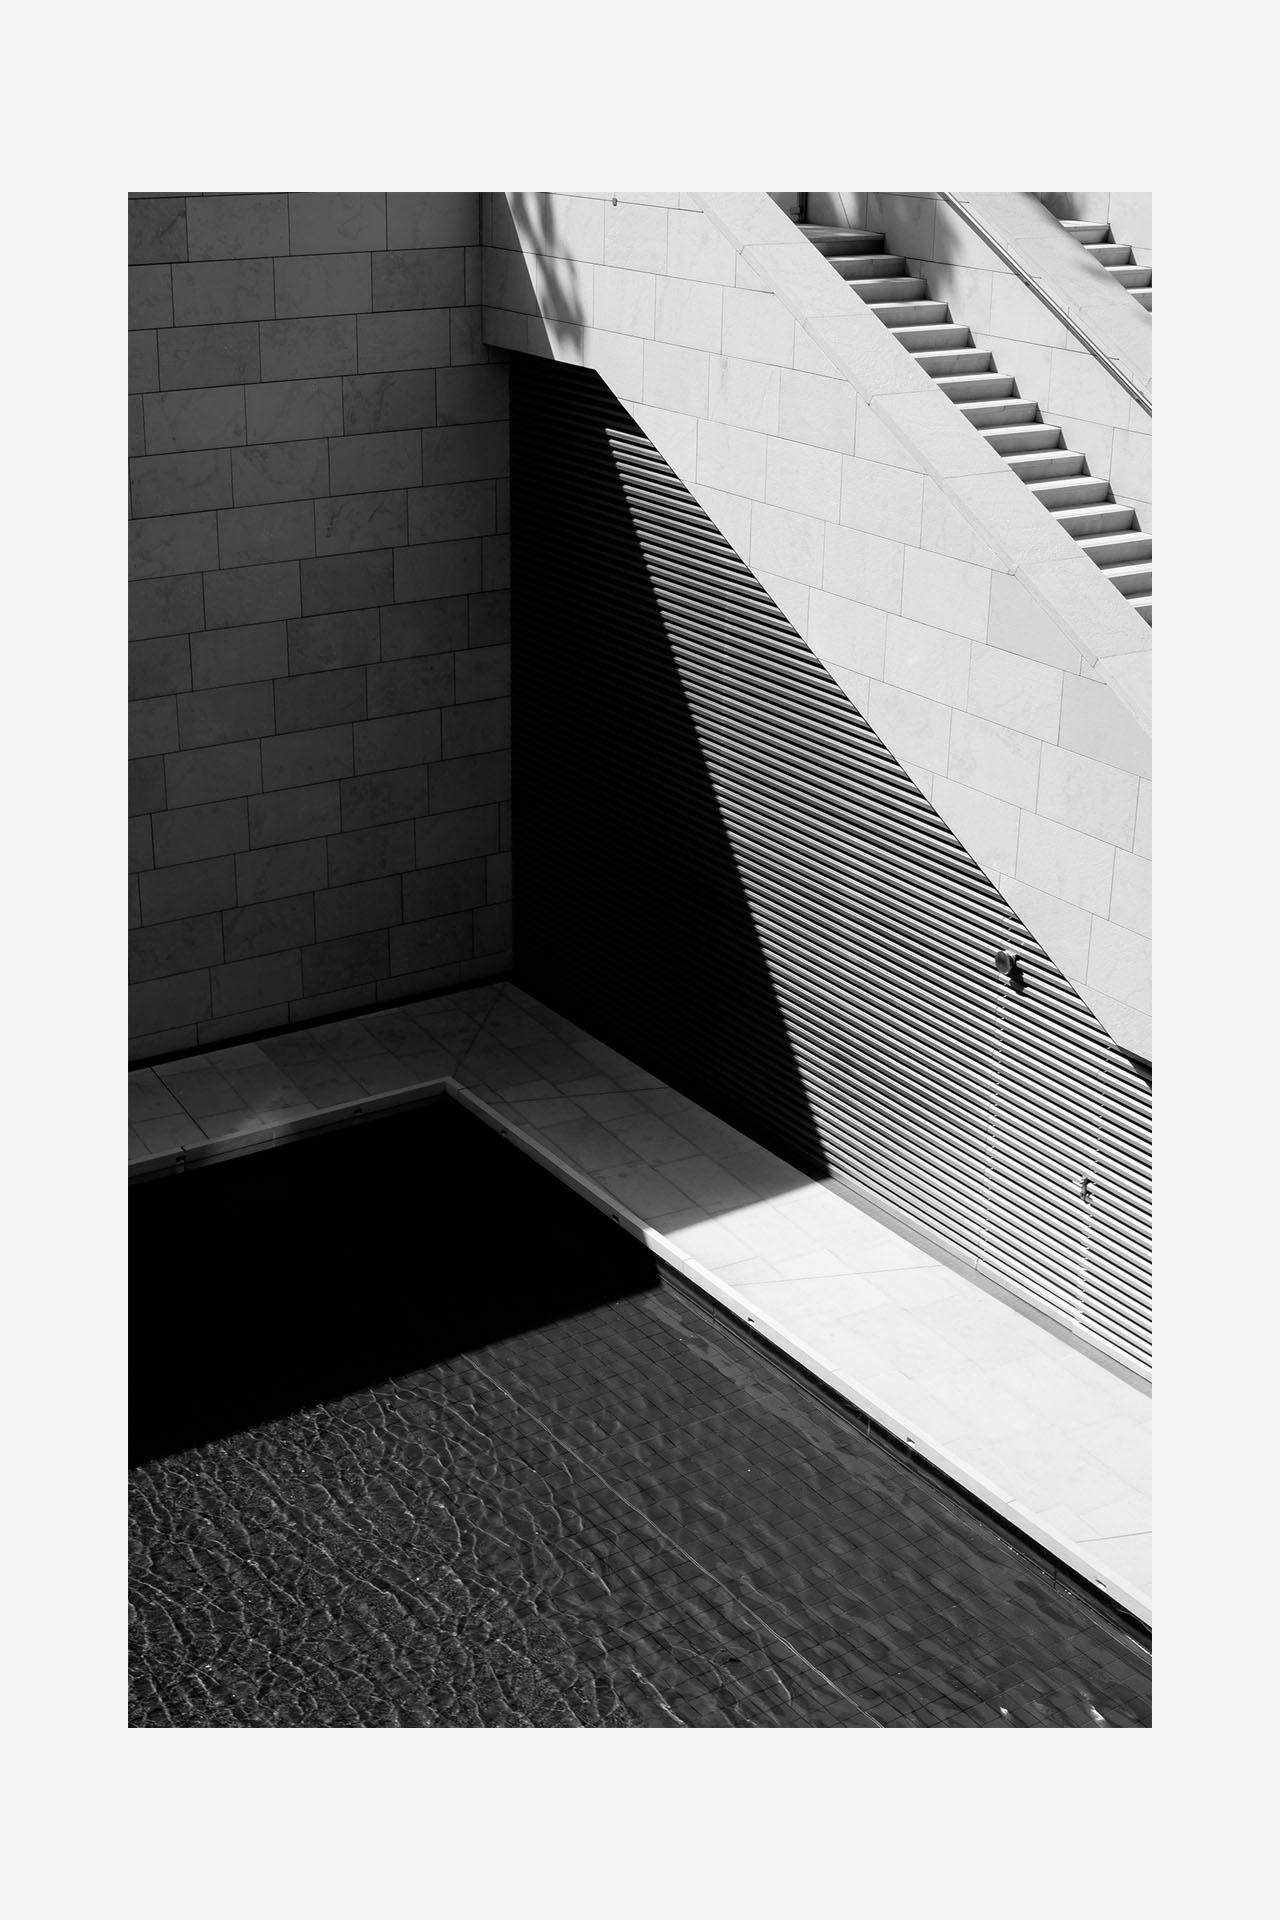 fondation-louis-vuitton-21B